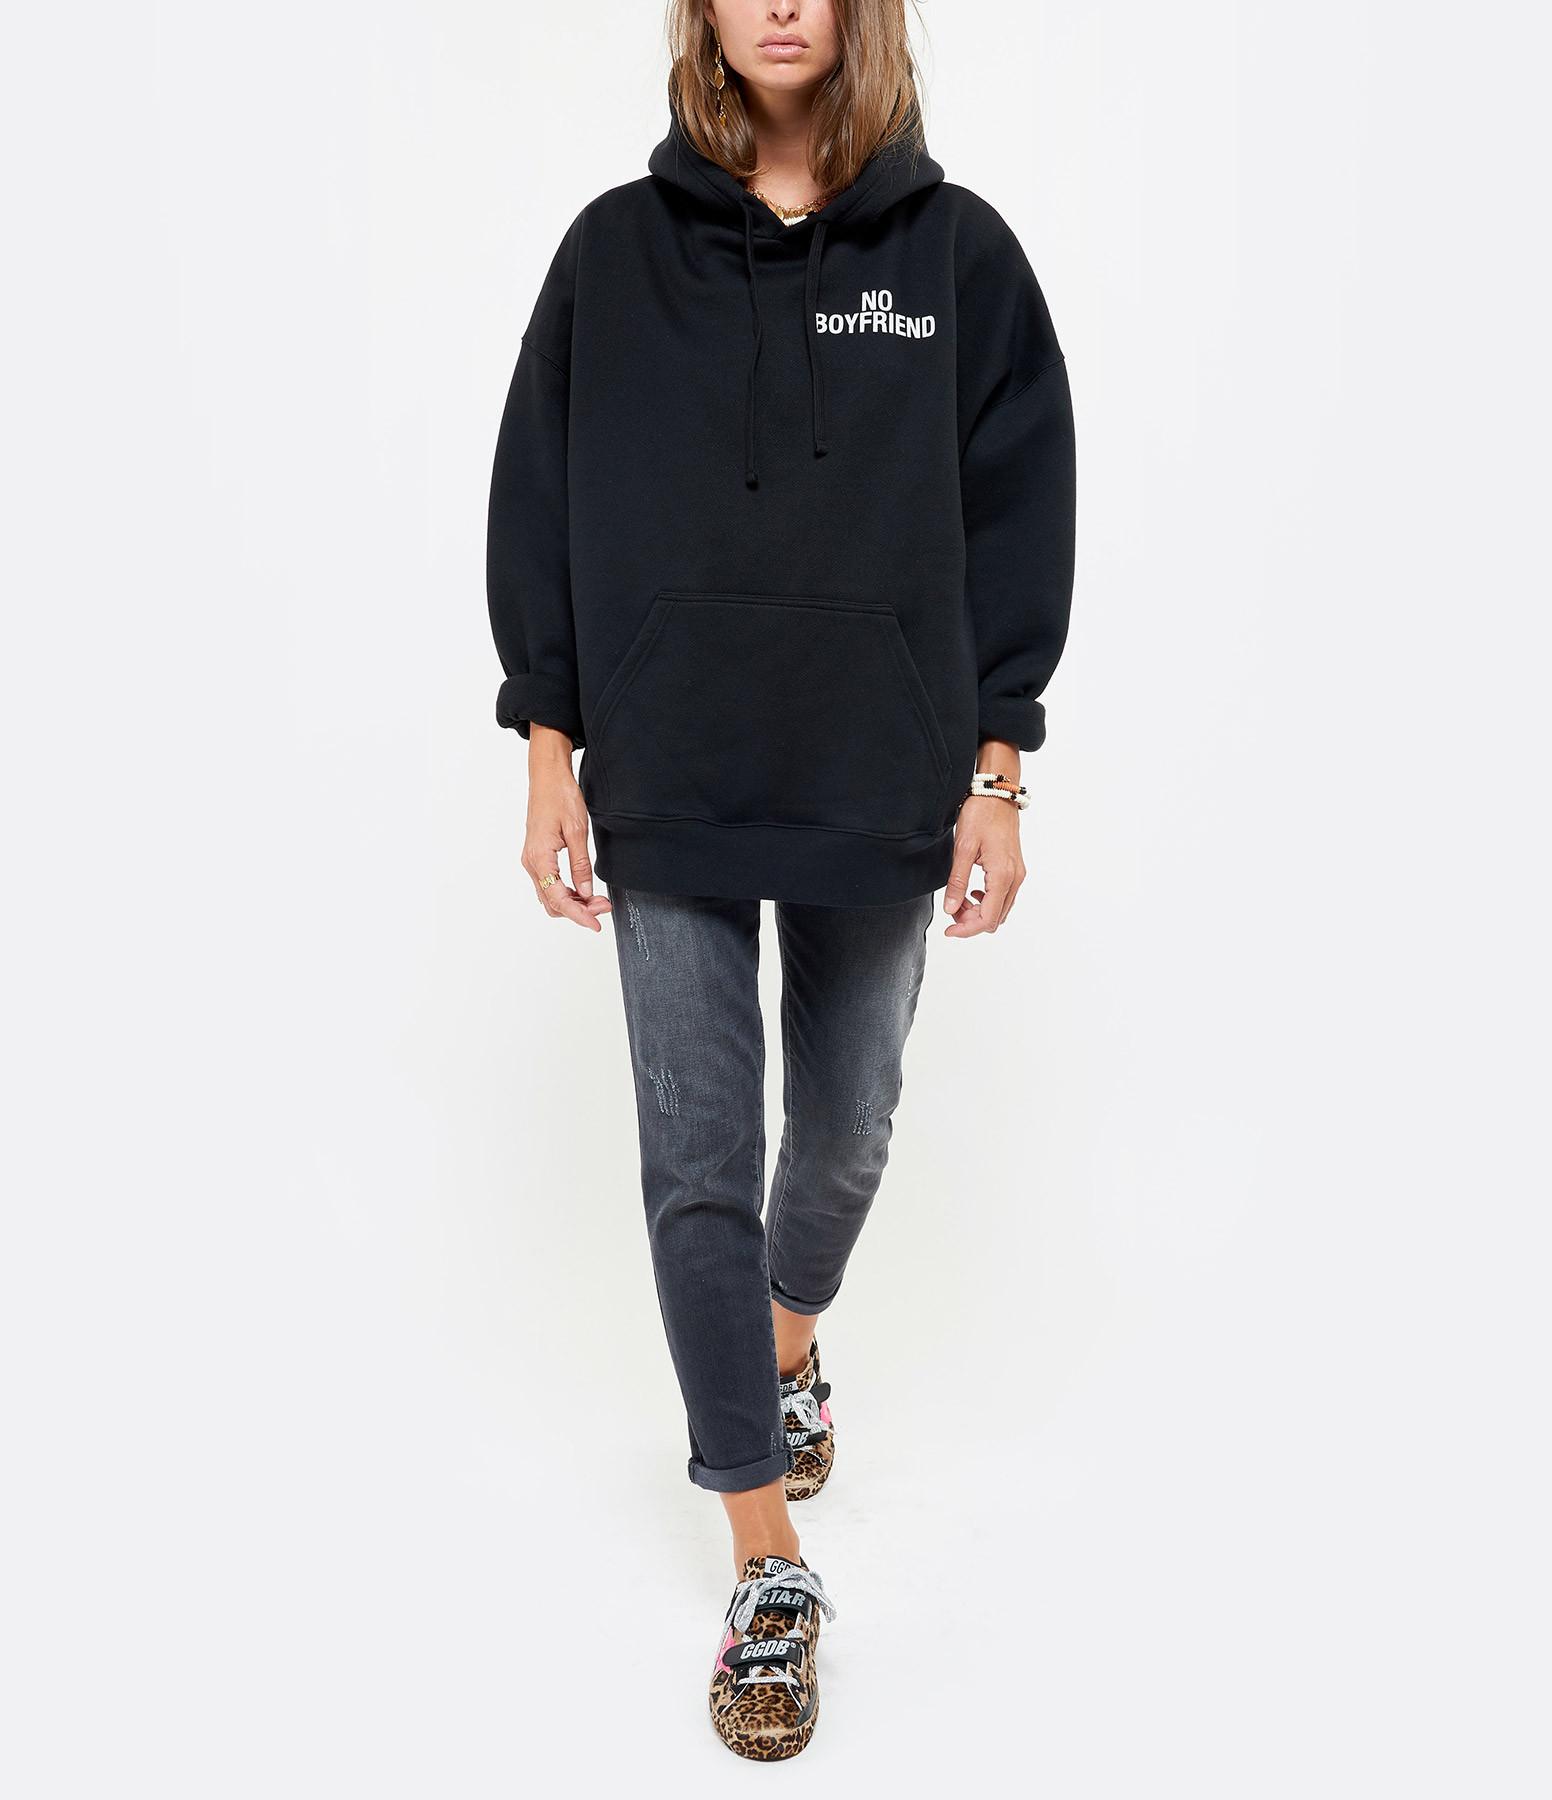 IRO - Sweatshirt Clava Coton Noir